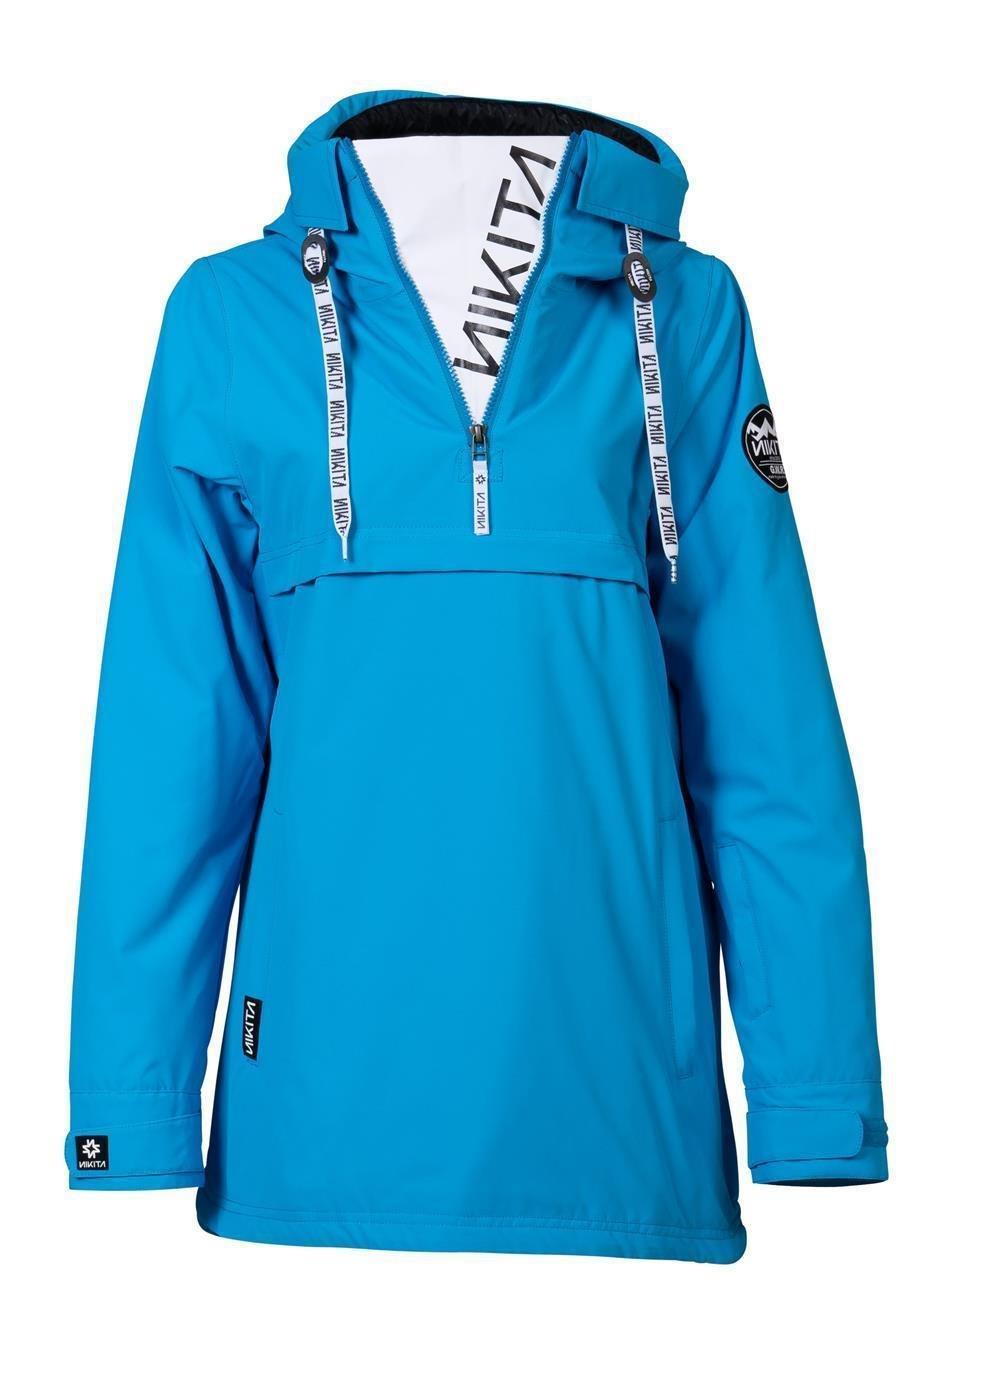 Nikita Hemlock Pullover Jacket